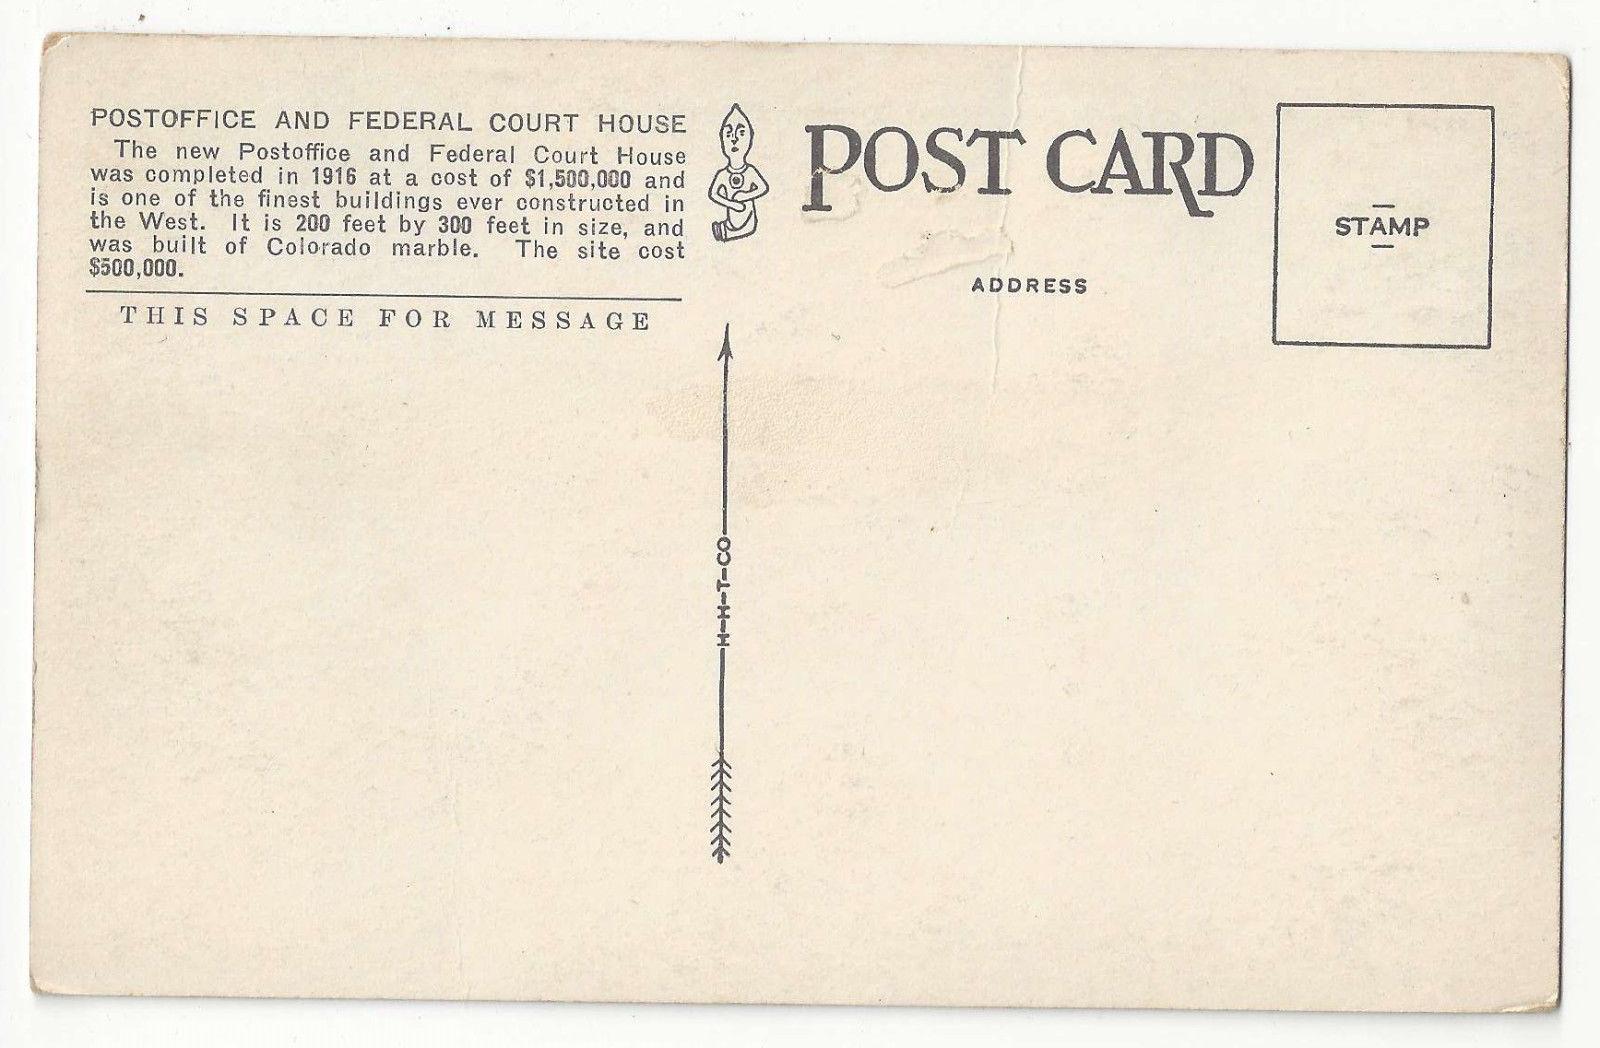 CO Denver Post Office and Federal Court House Vtg Tammen Postcard